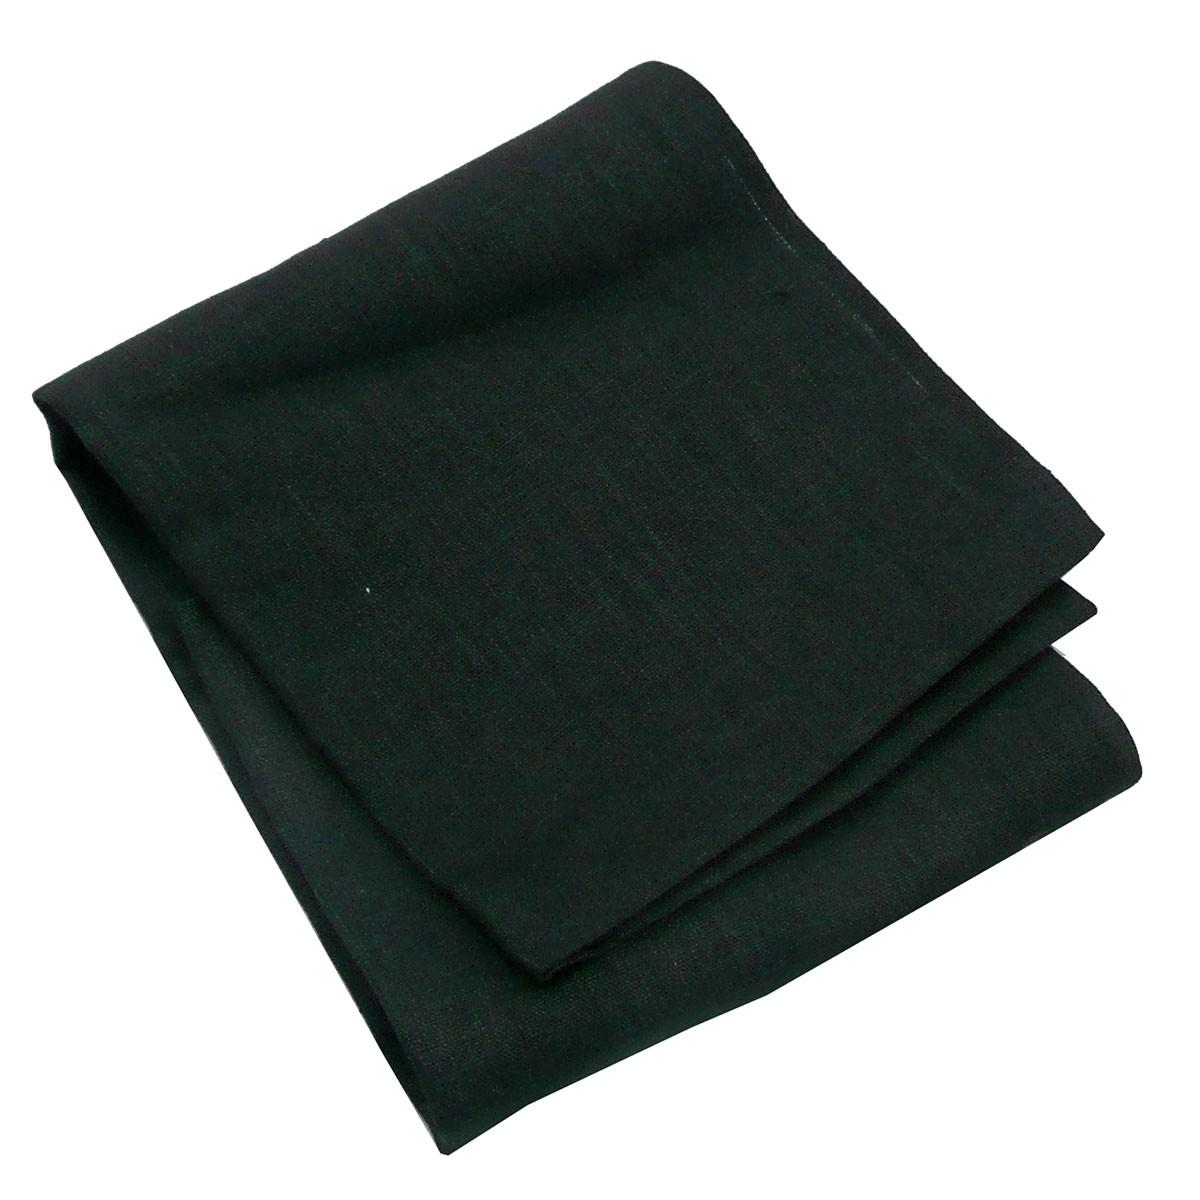 leinentischl ufer tischl ufer erik 1 lagig 47x150cm. Black Bedroom Furniture Sets. Home Design Ideas